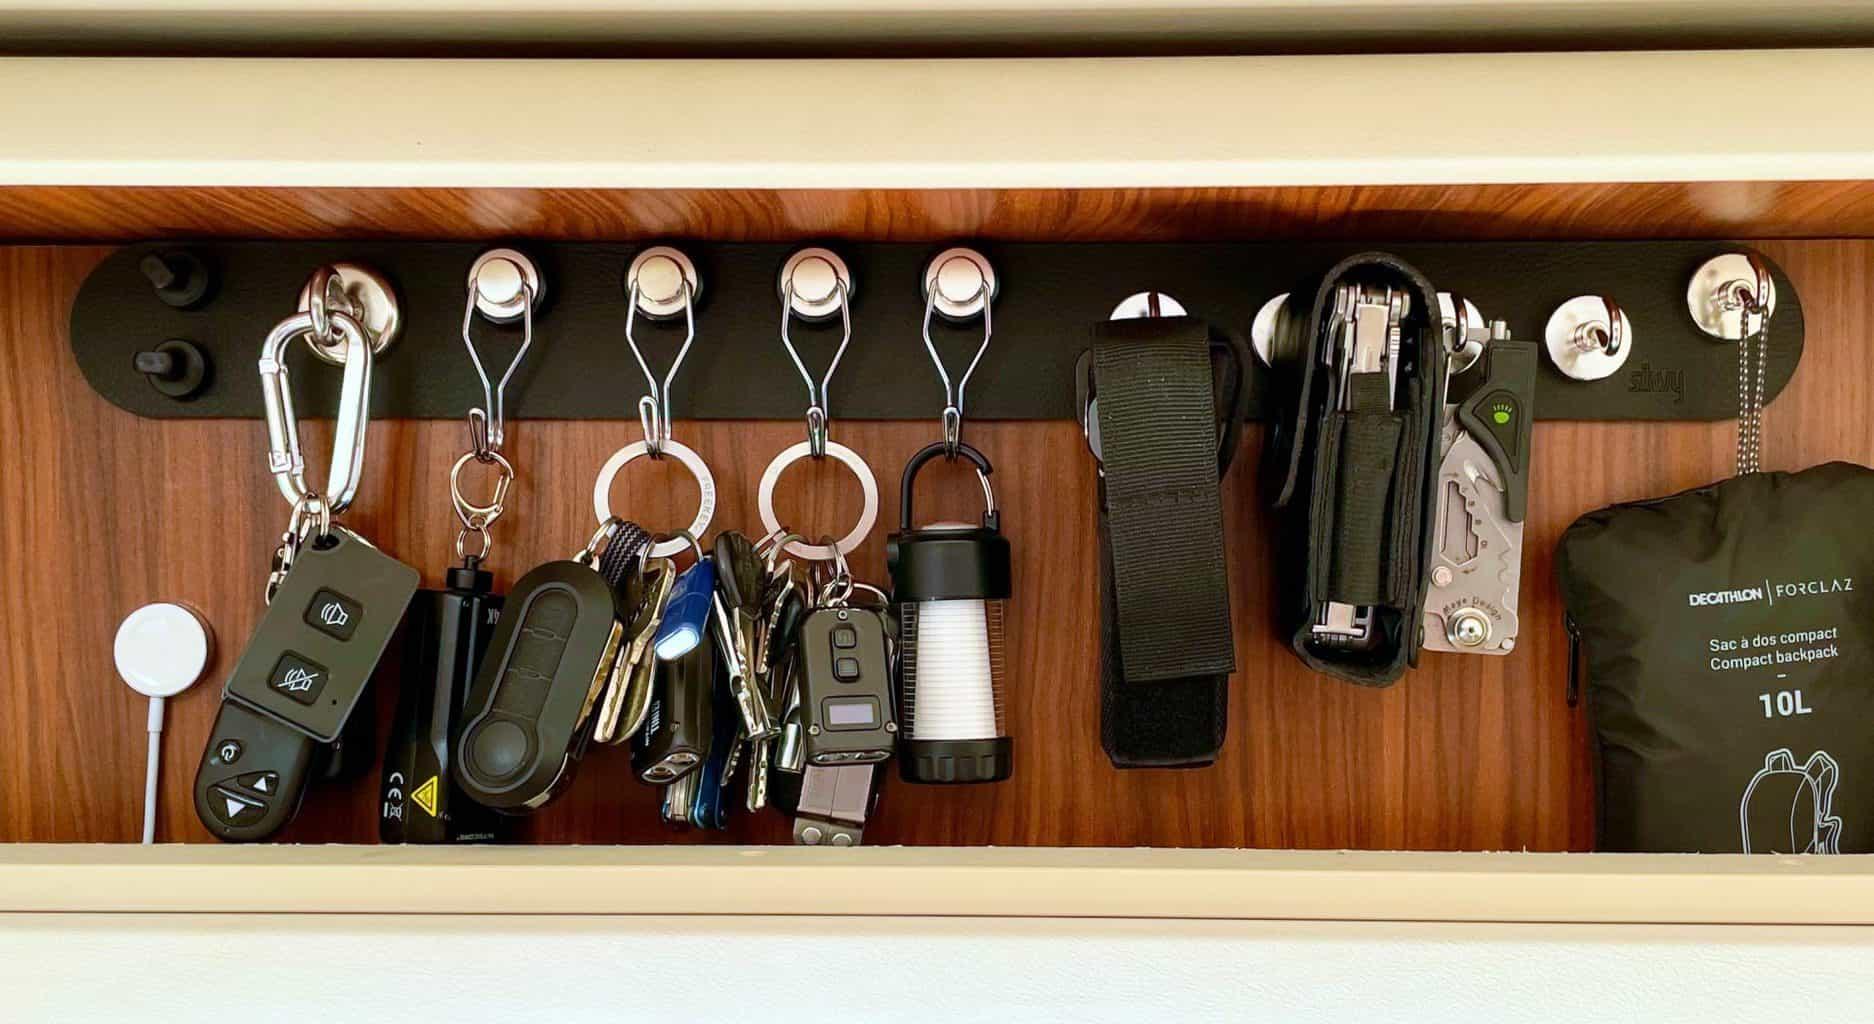 Silwy-Schlüsselbrett-Schlüssel-Taschenlampen-Leatherman-LED3